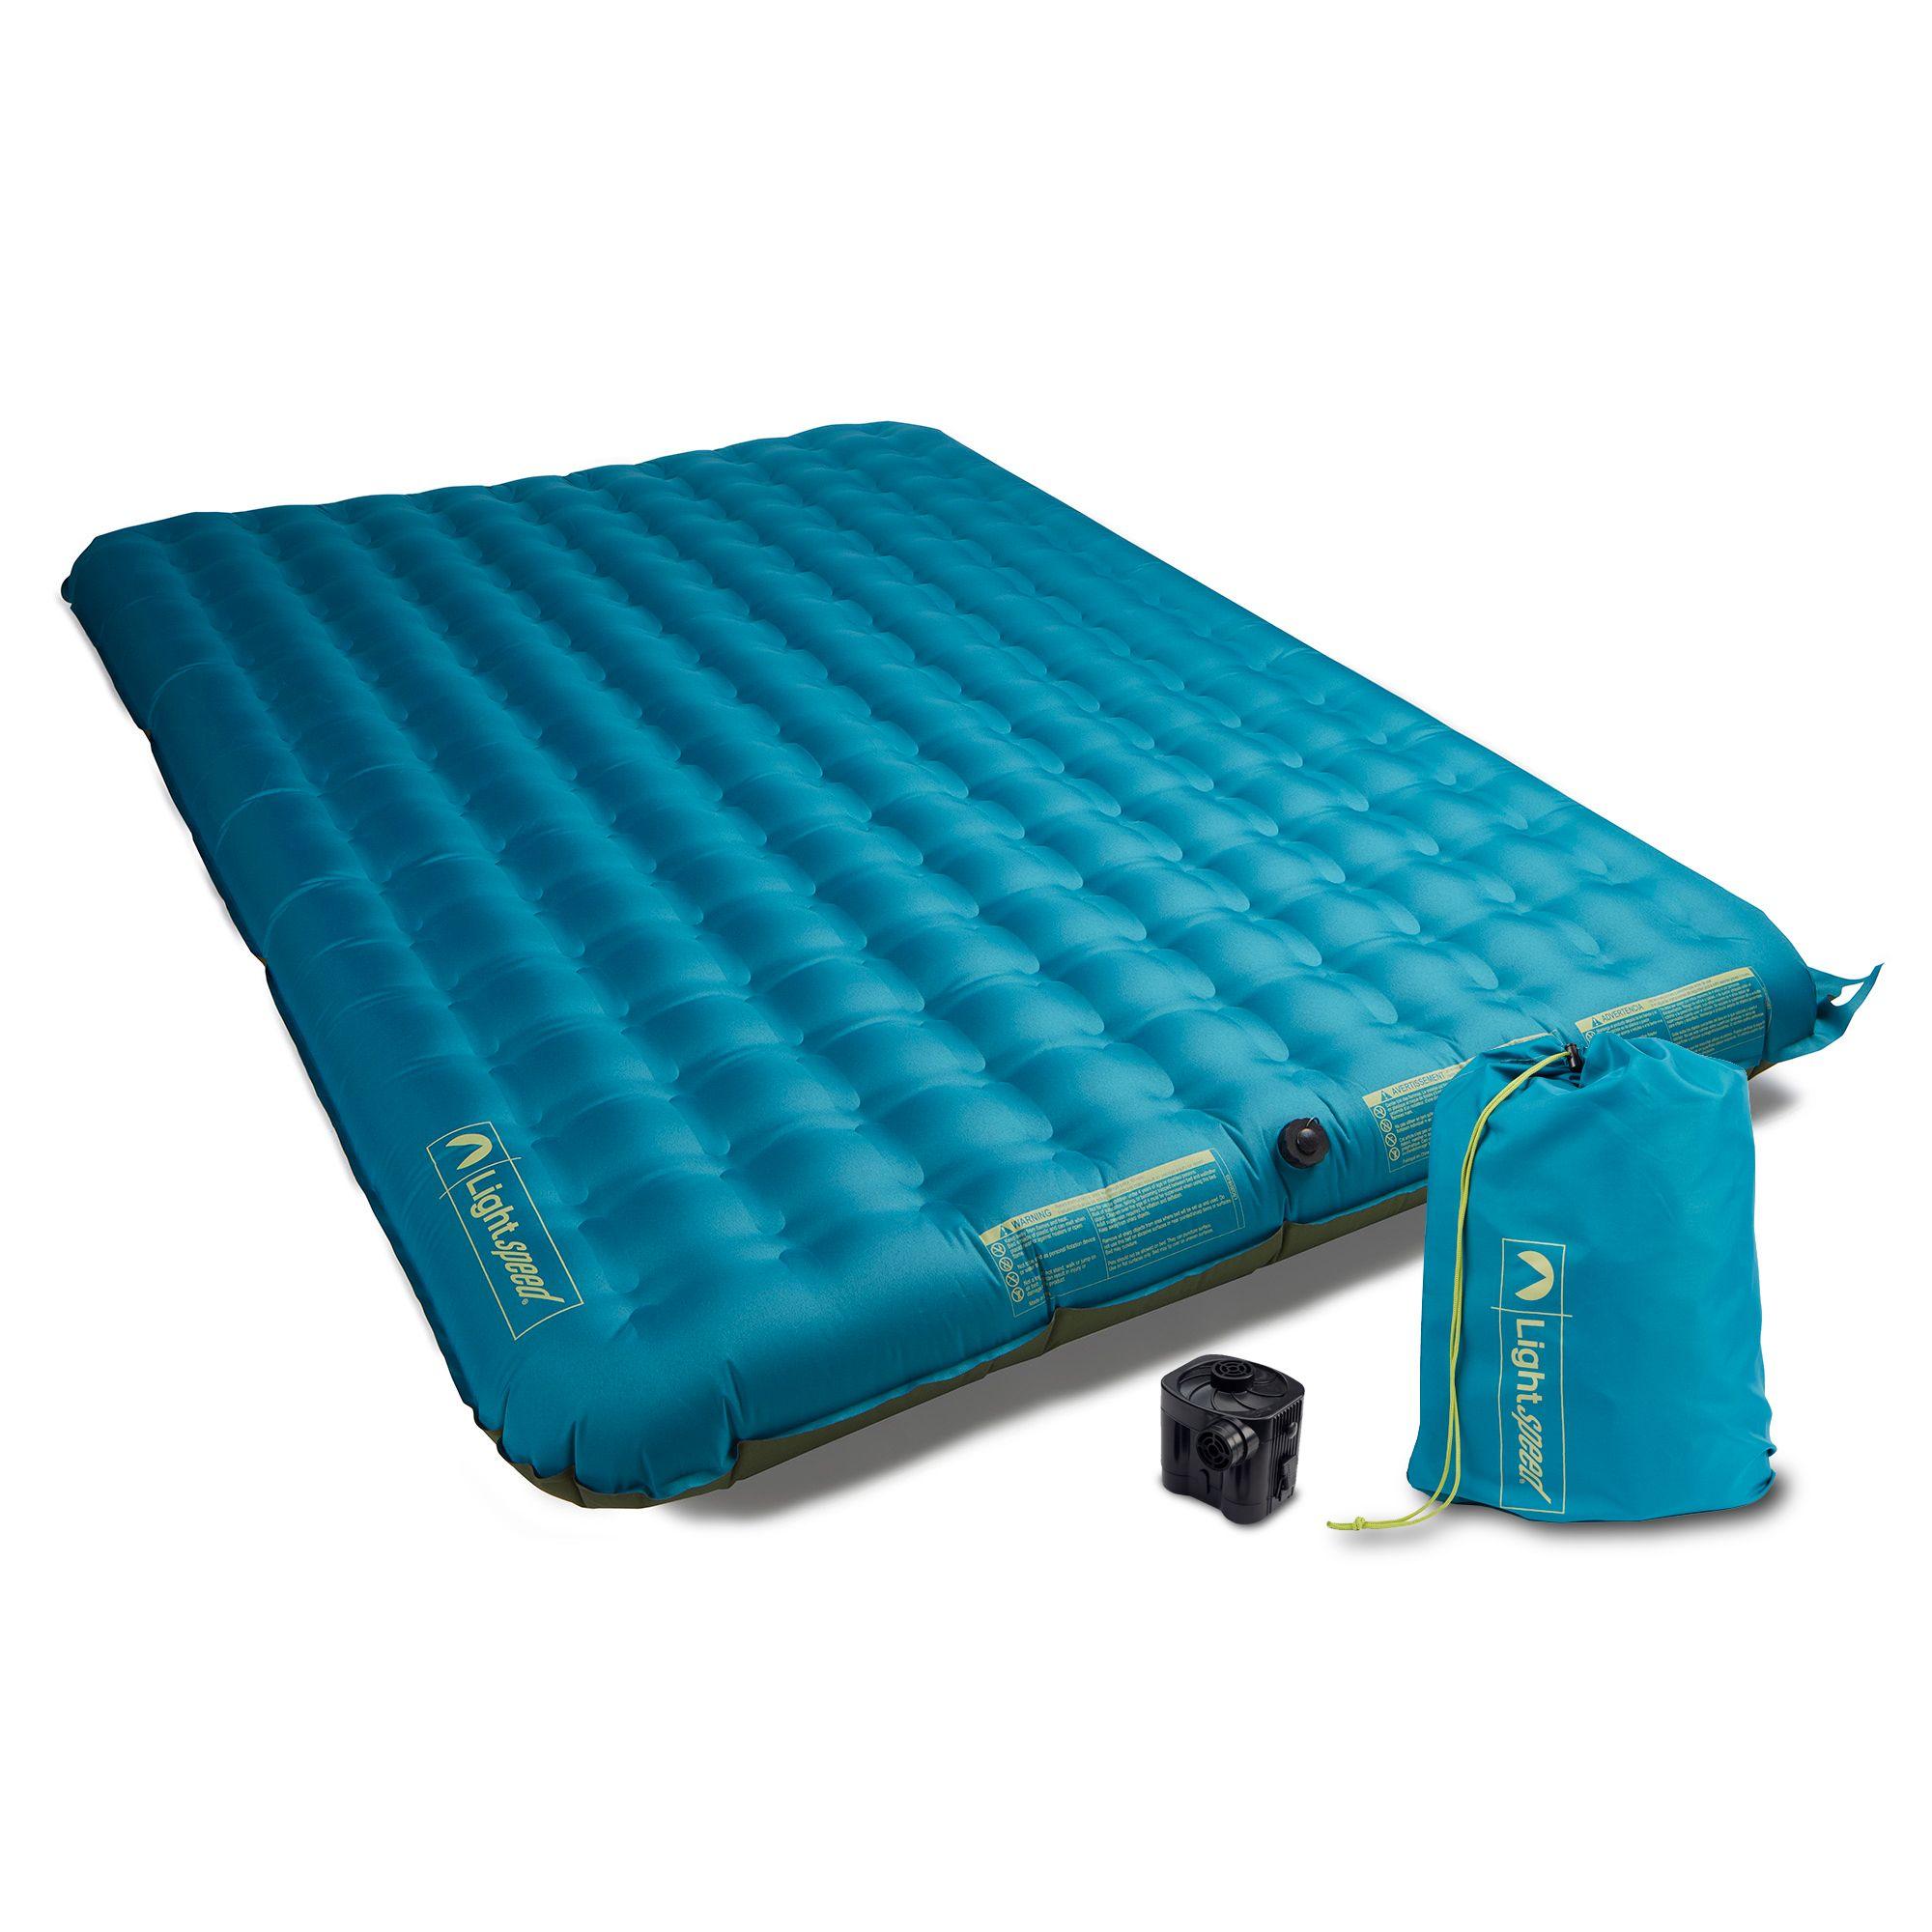 Best air mattresses for 2020 SoundAsleep, REI and more